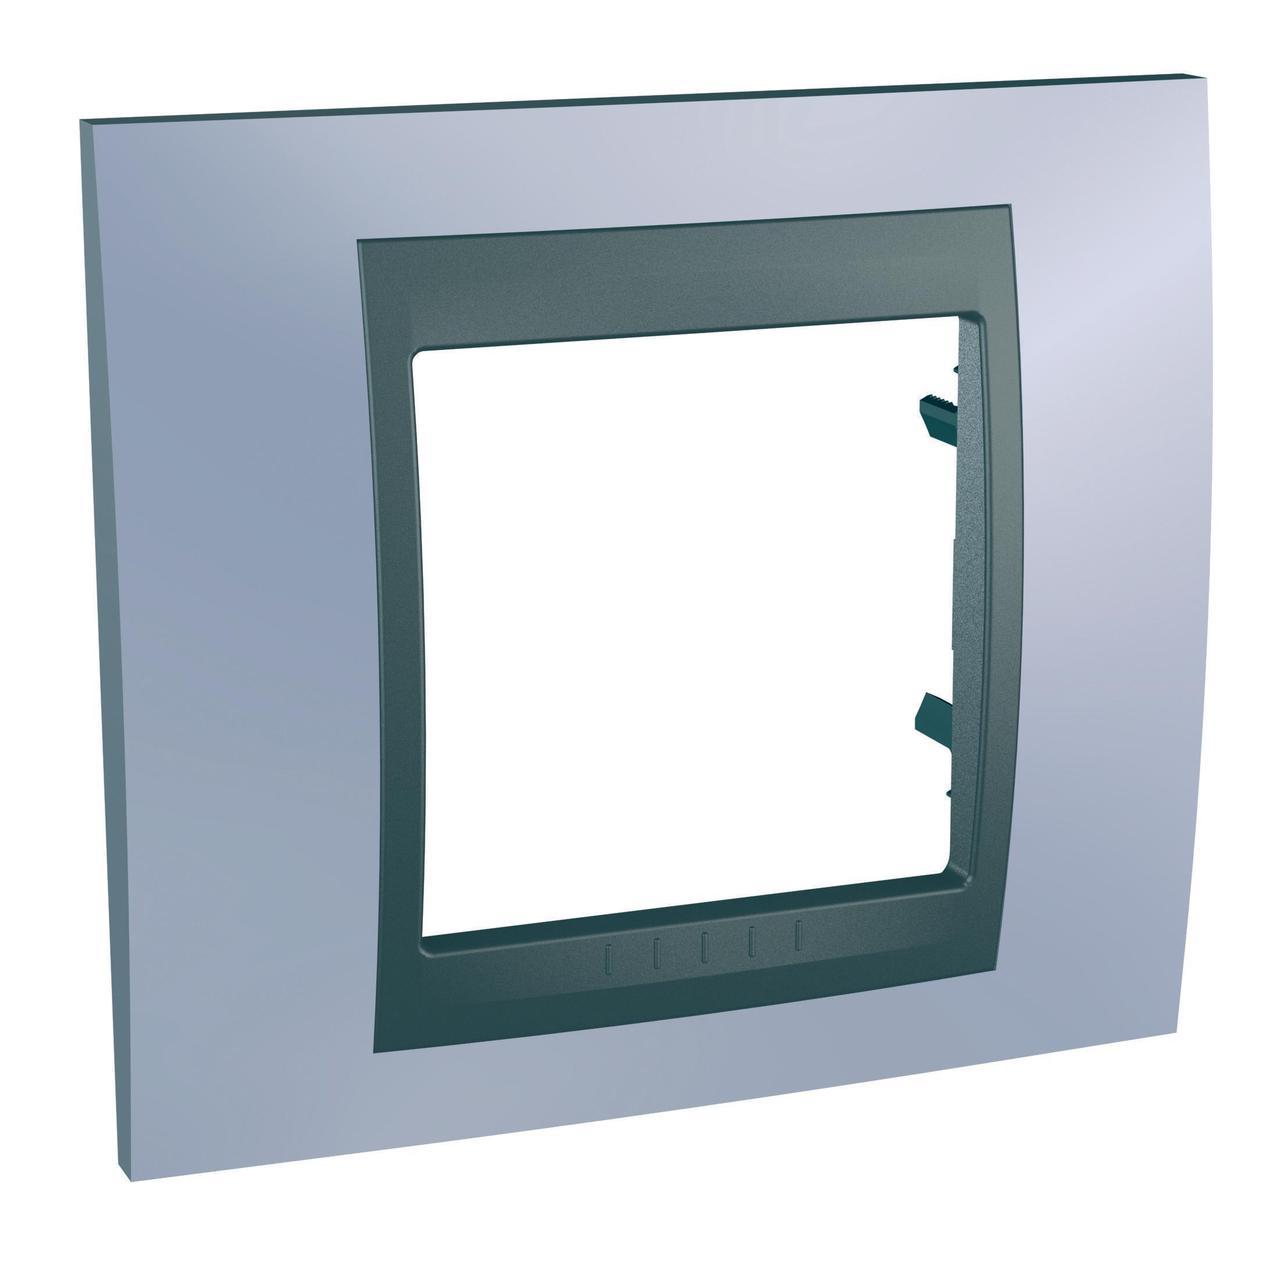 Рамка 1-ая (одинарная), Берилл/Графит (металл), серия UNICA TOP/CLASS, Schneider Electric